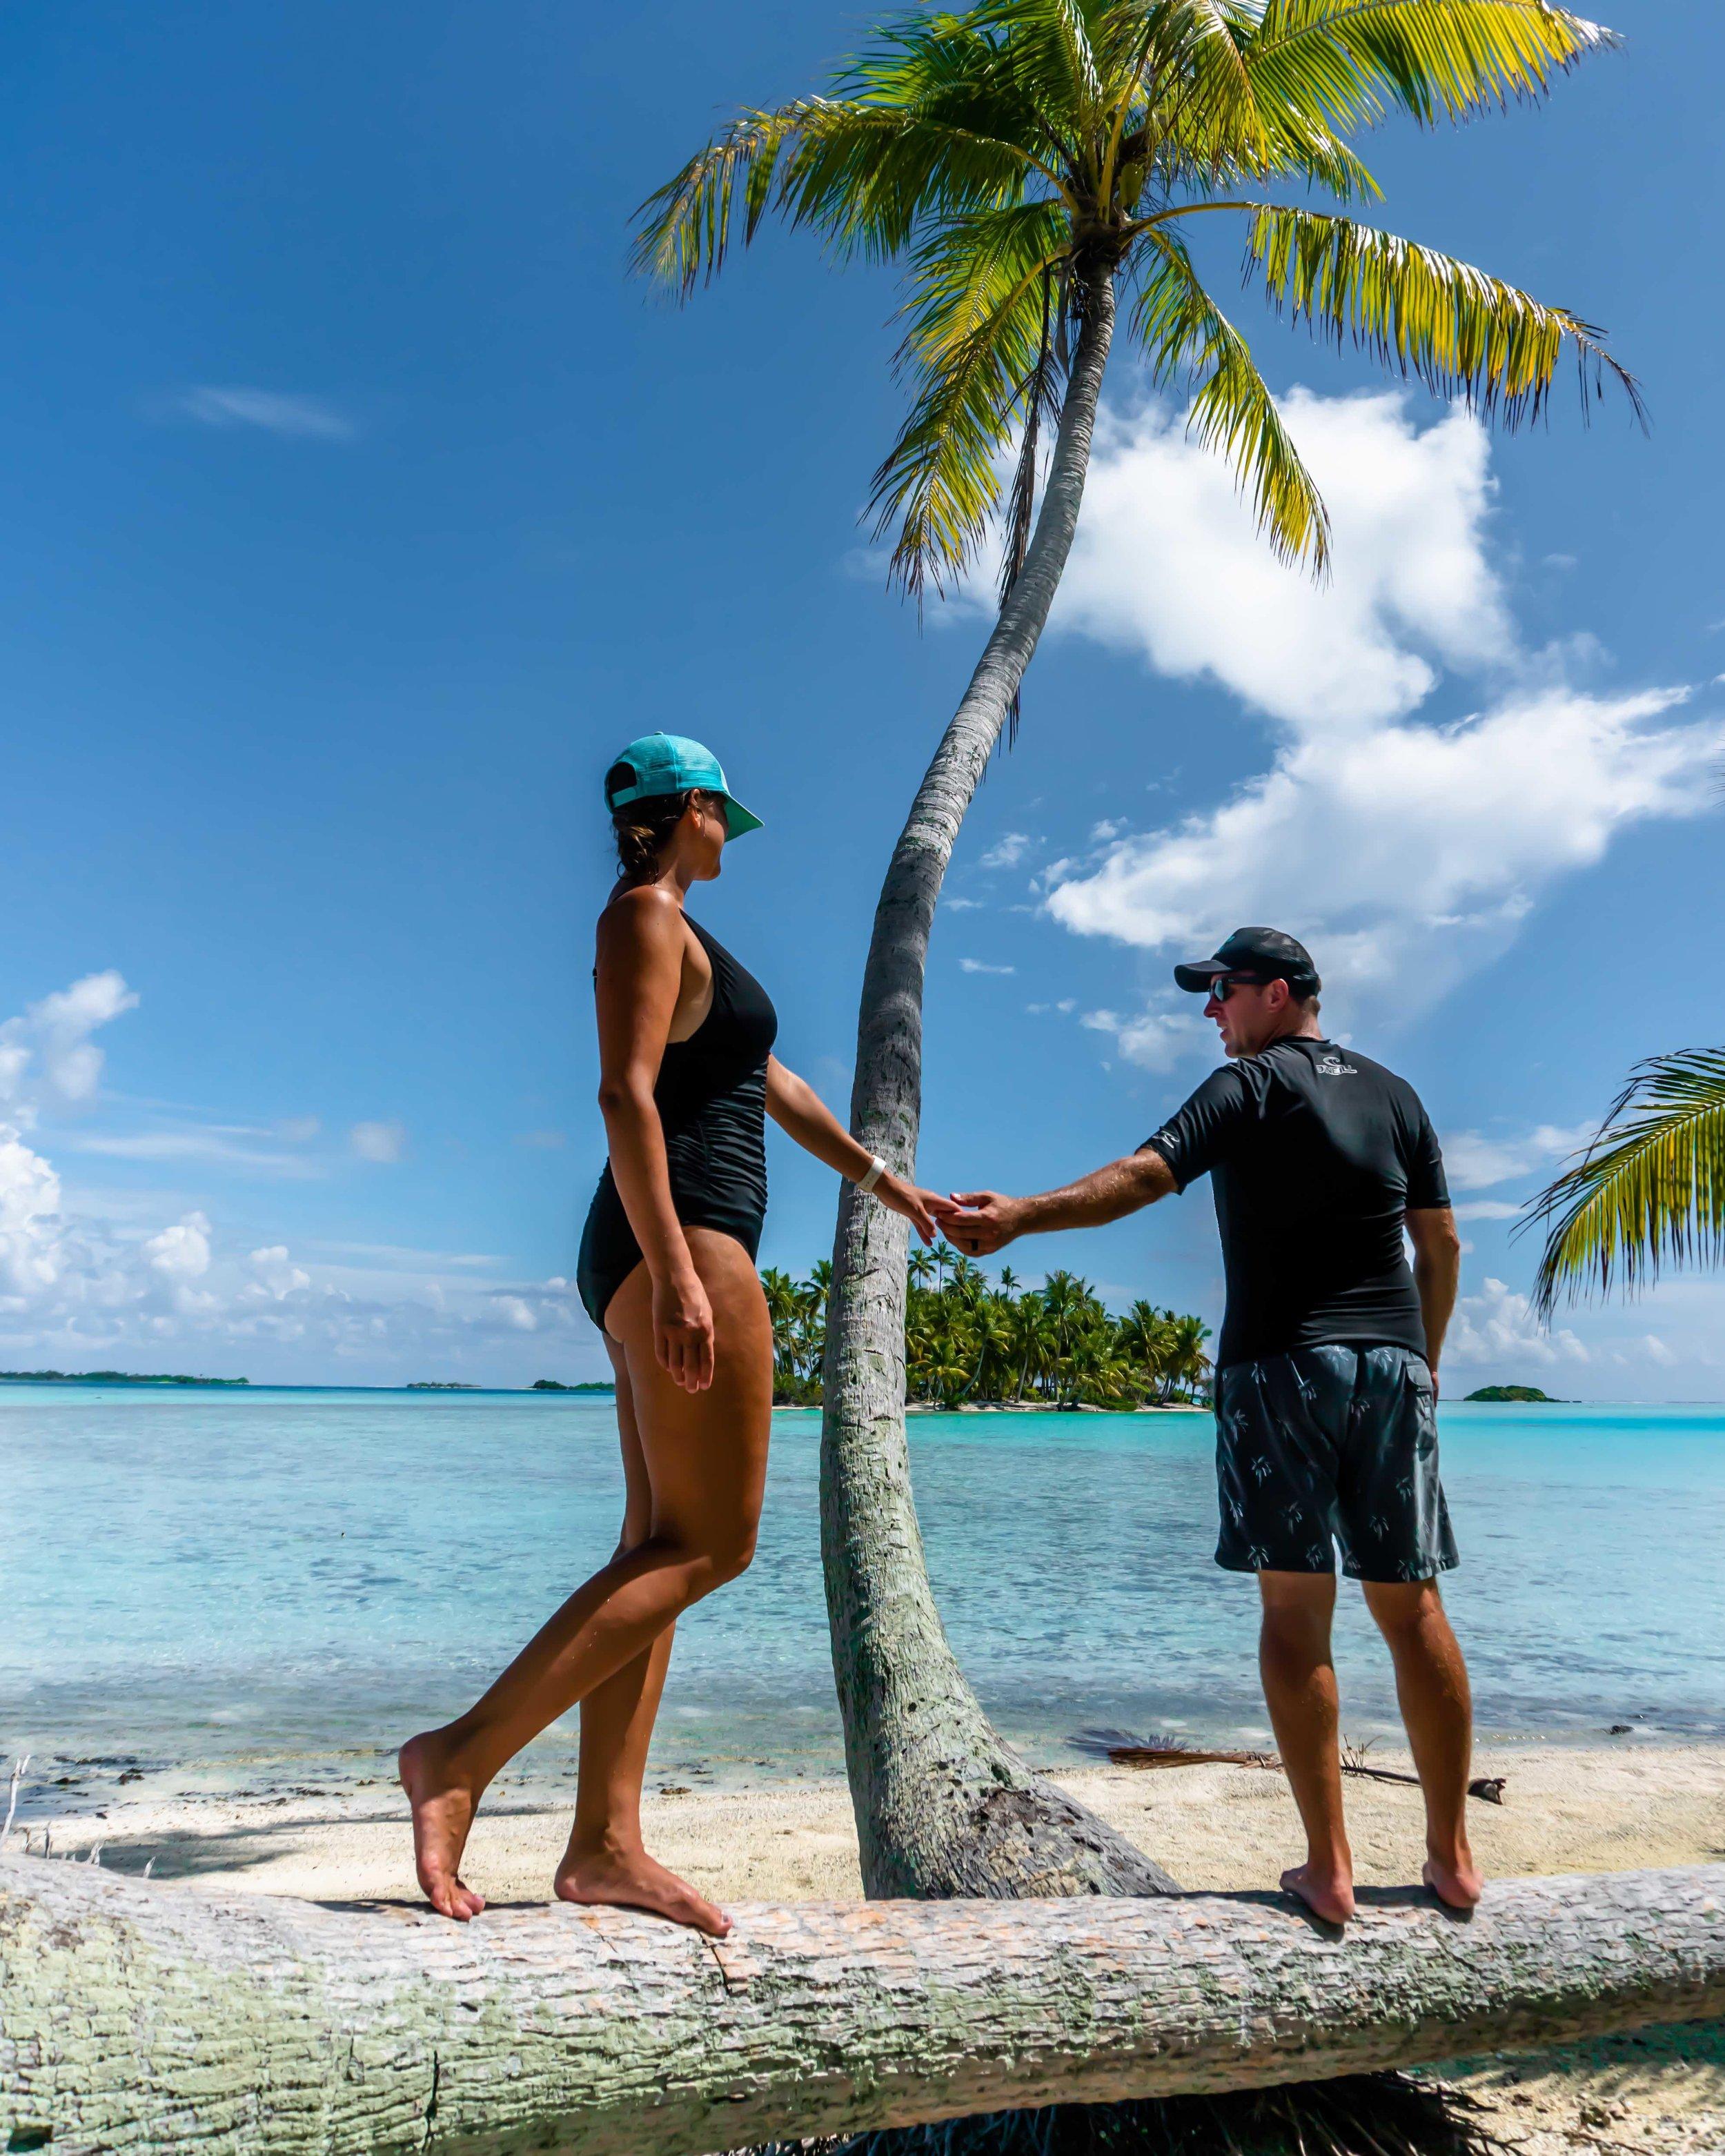 tropical_paradise_beach_island_rangiroa_couple_south pacific_beach_palm tree 3.jpg